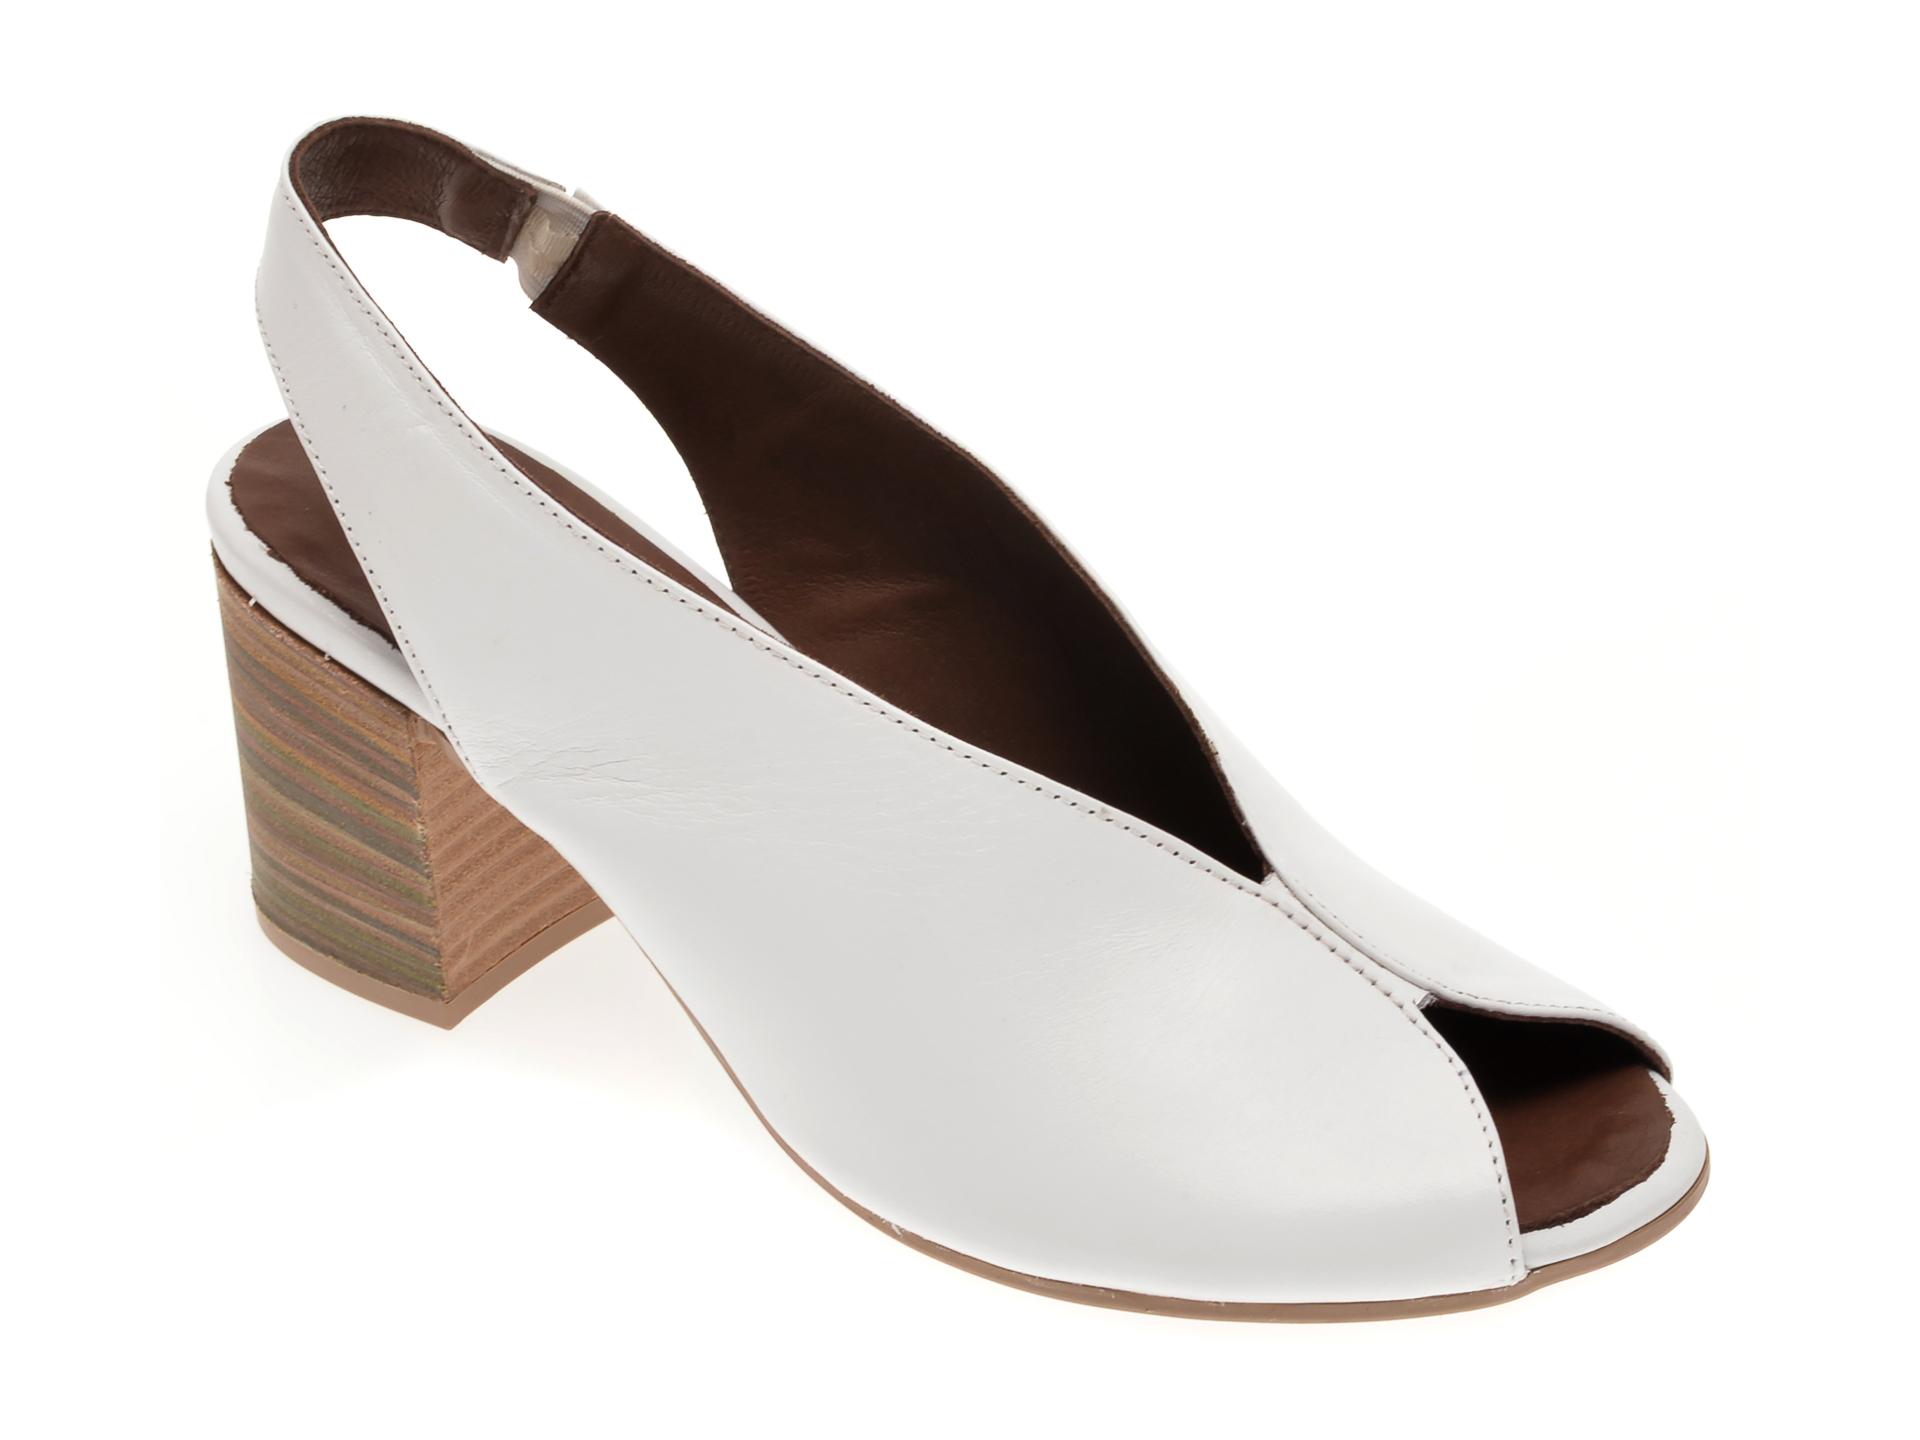 Sandale BABOOS albe, 1806, din piele naturala